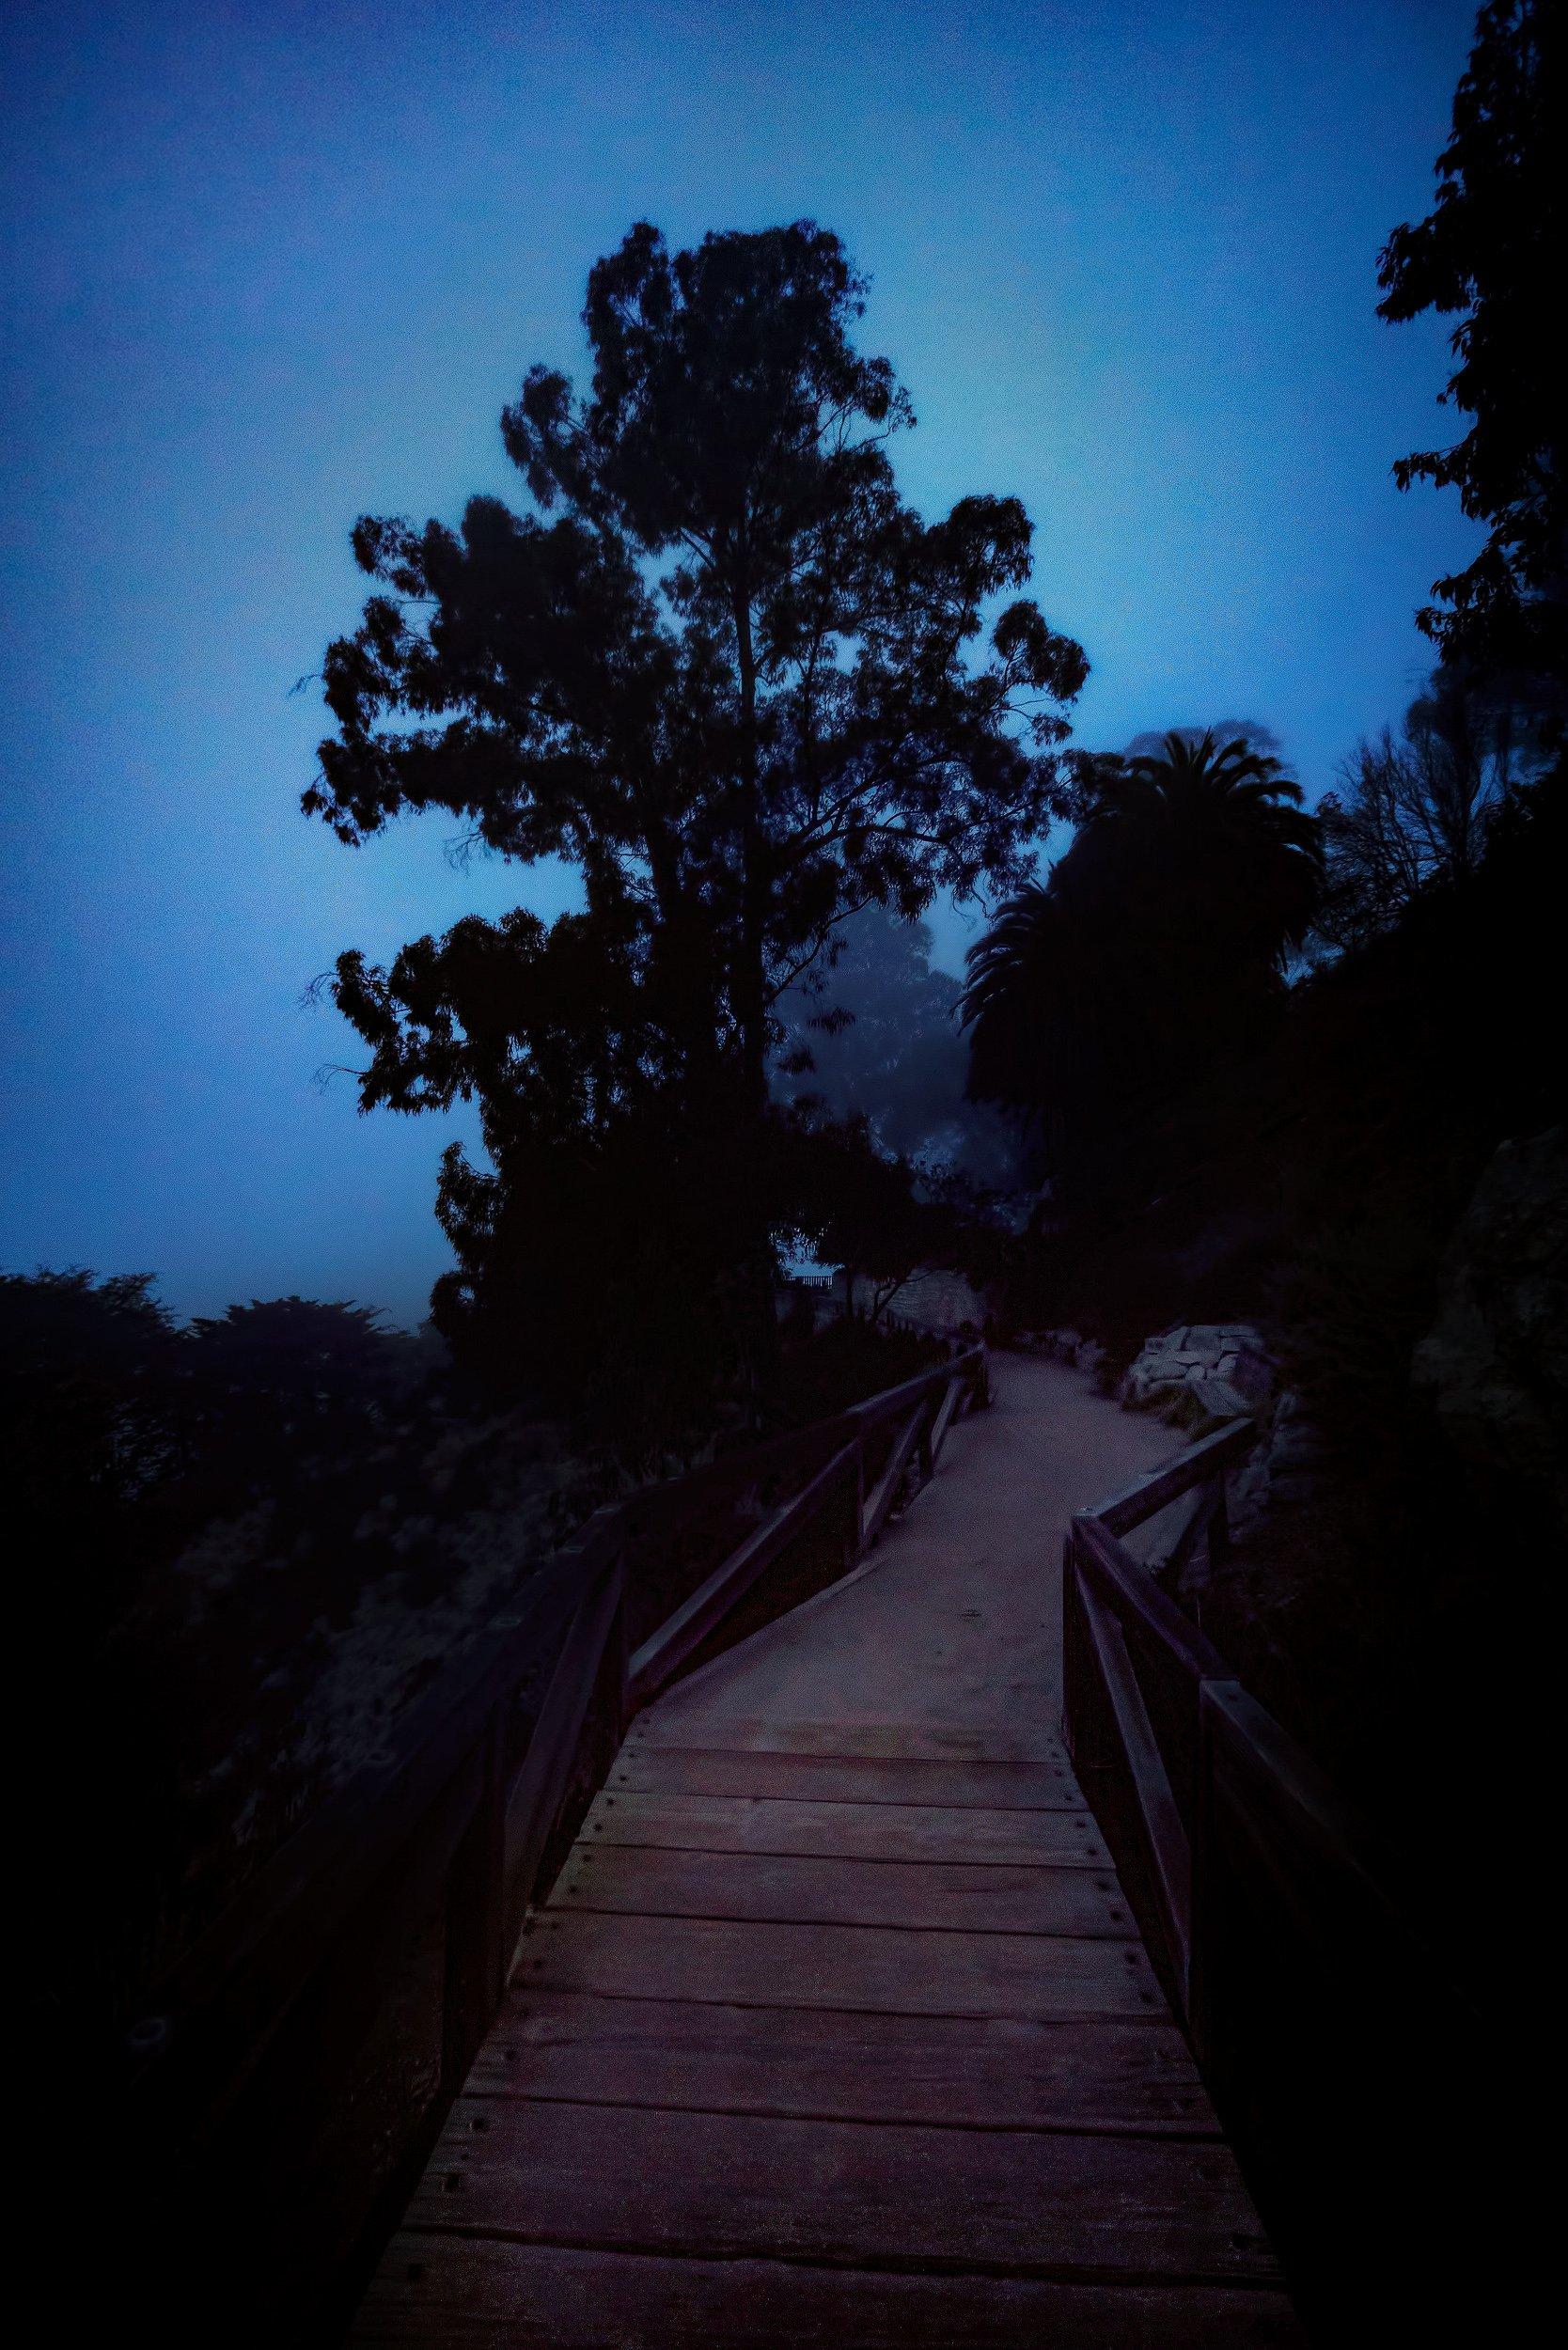 McWay Falls Trail at Julia Pfeiffer Burns State Park